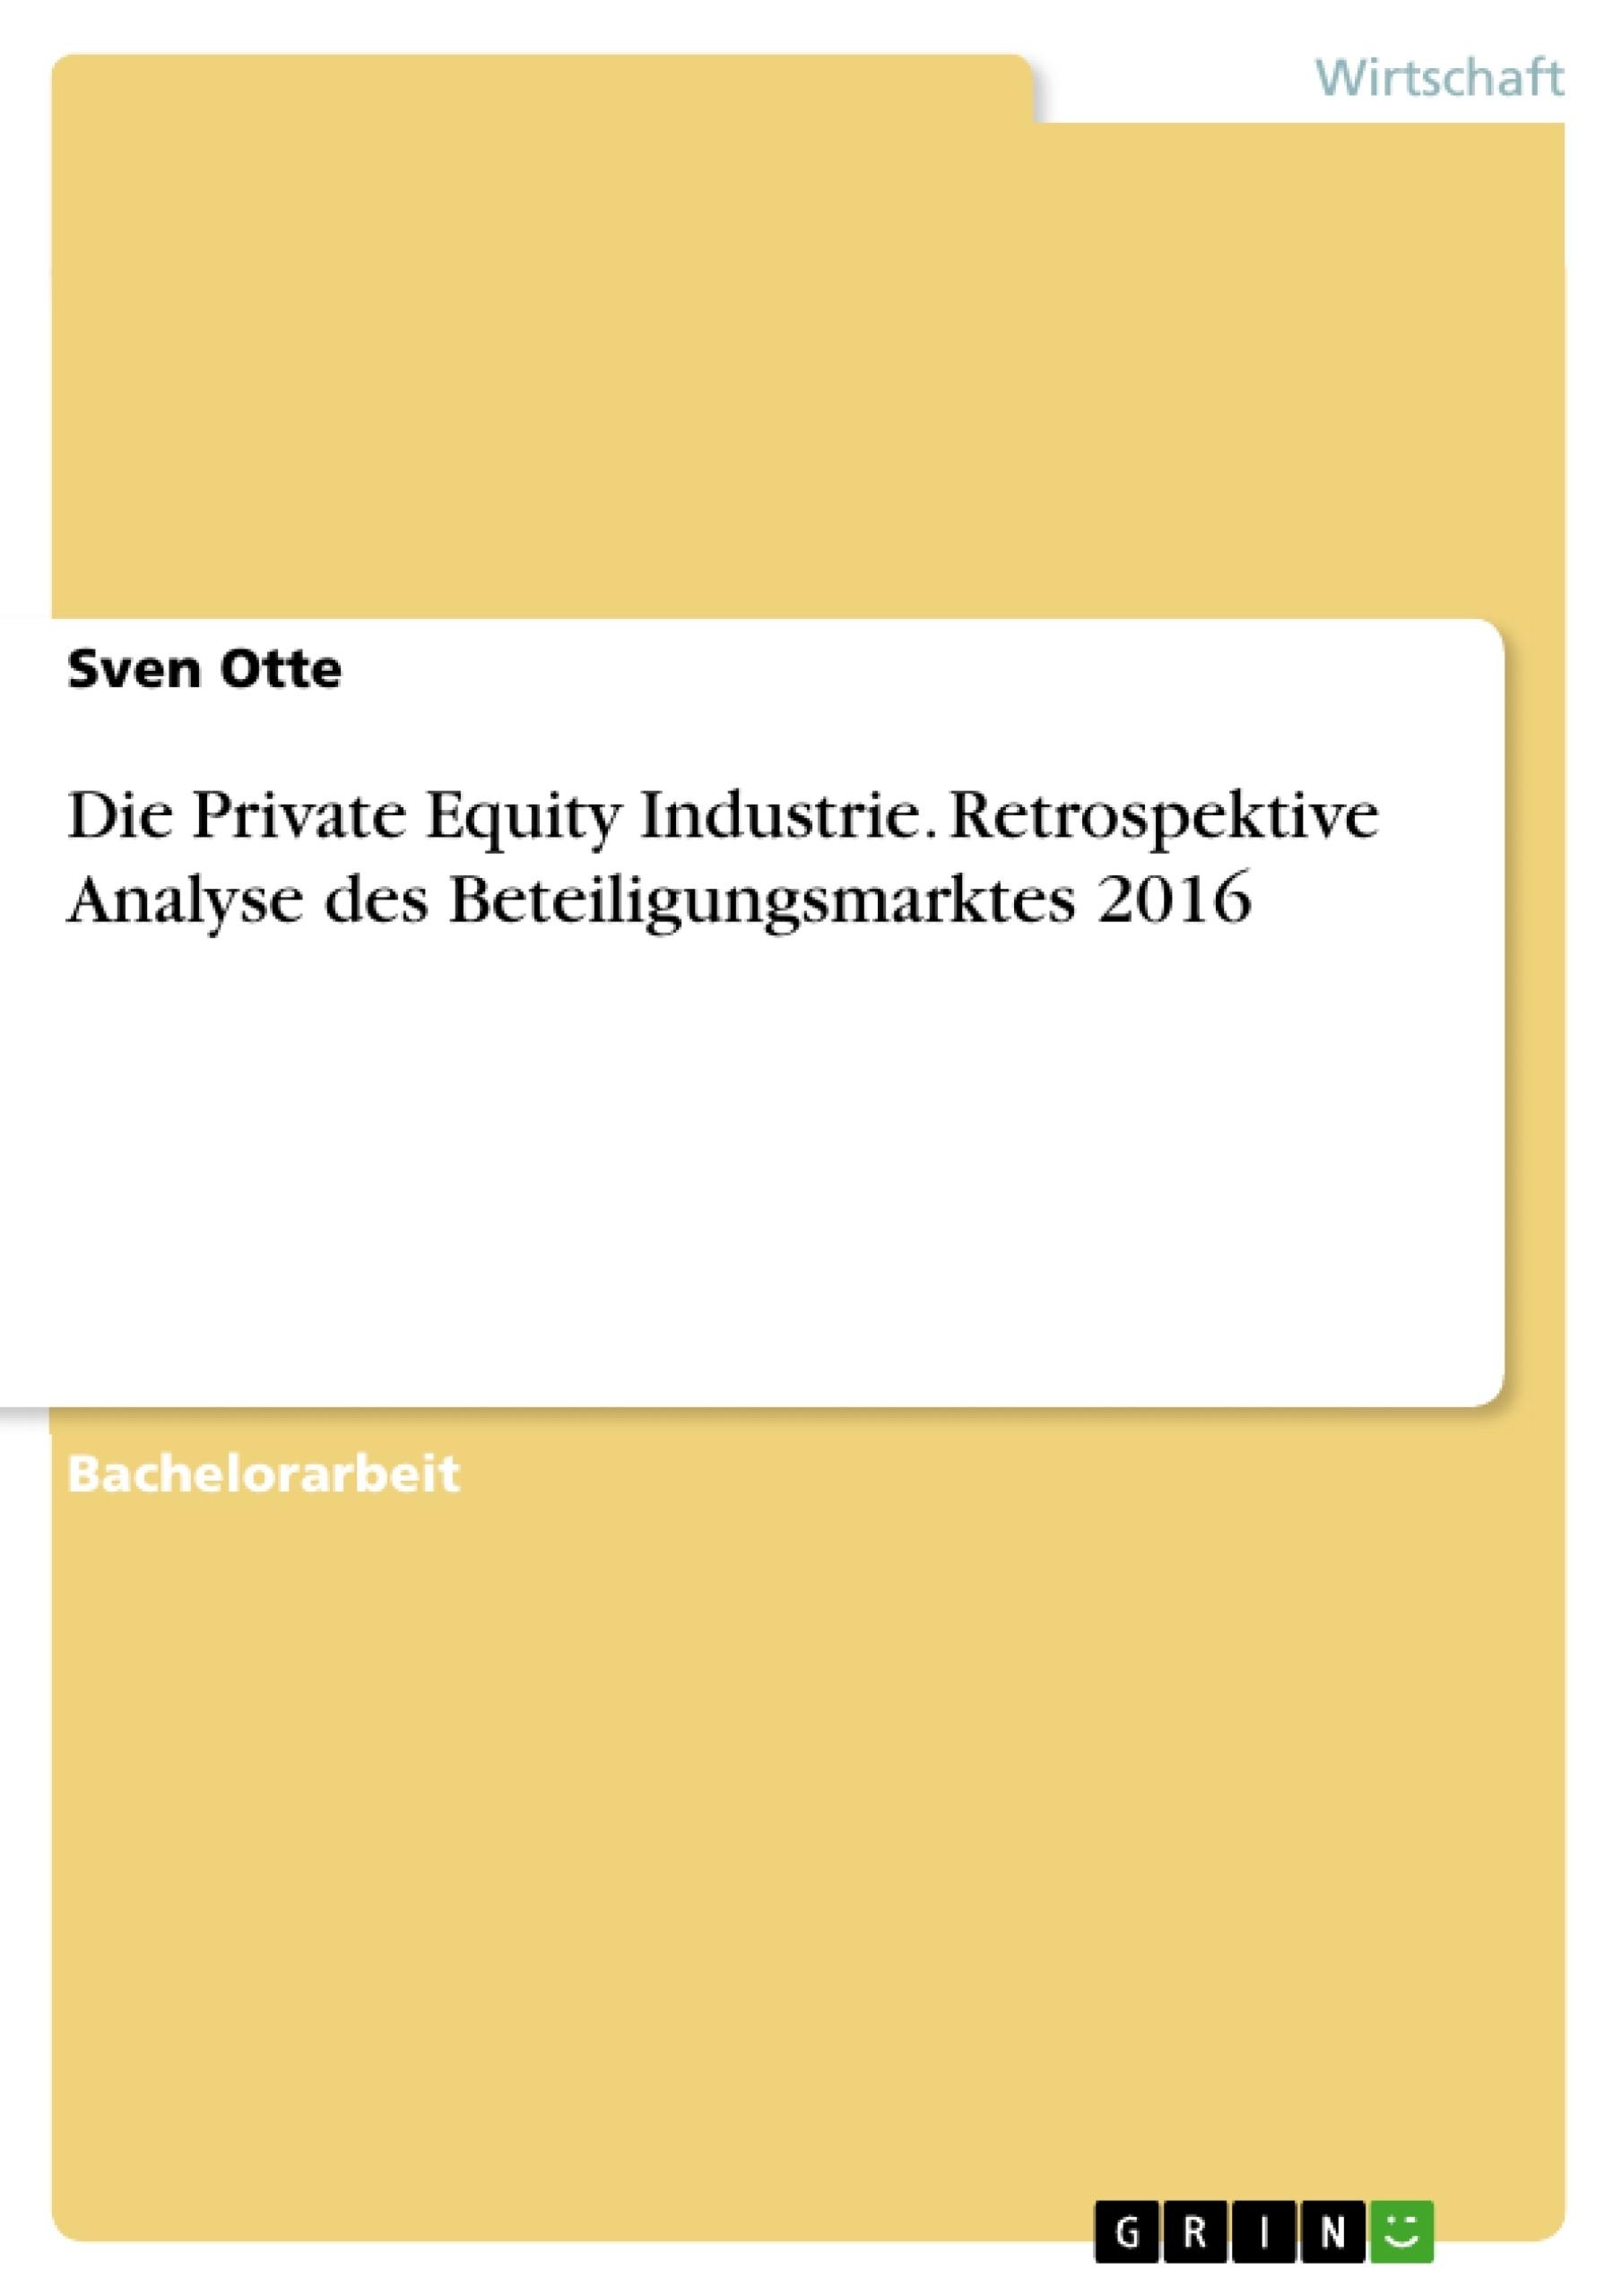 Titel: Die Private Equity Industrie. Retrospektive Analyse des Beteiligungsmarktes 2016